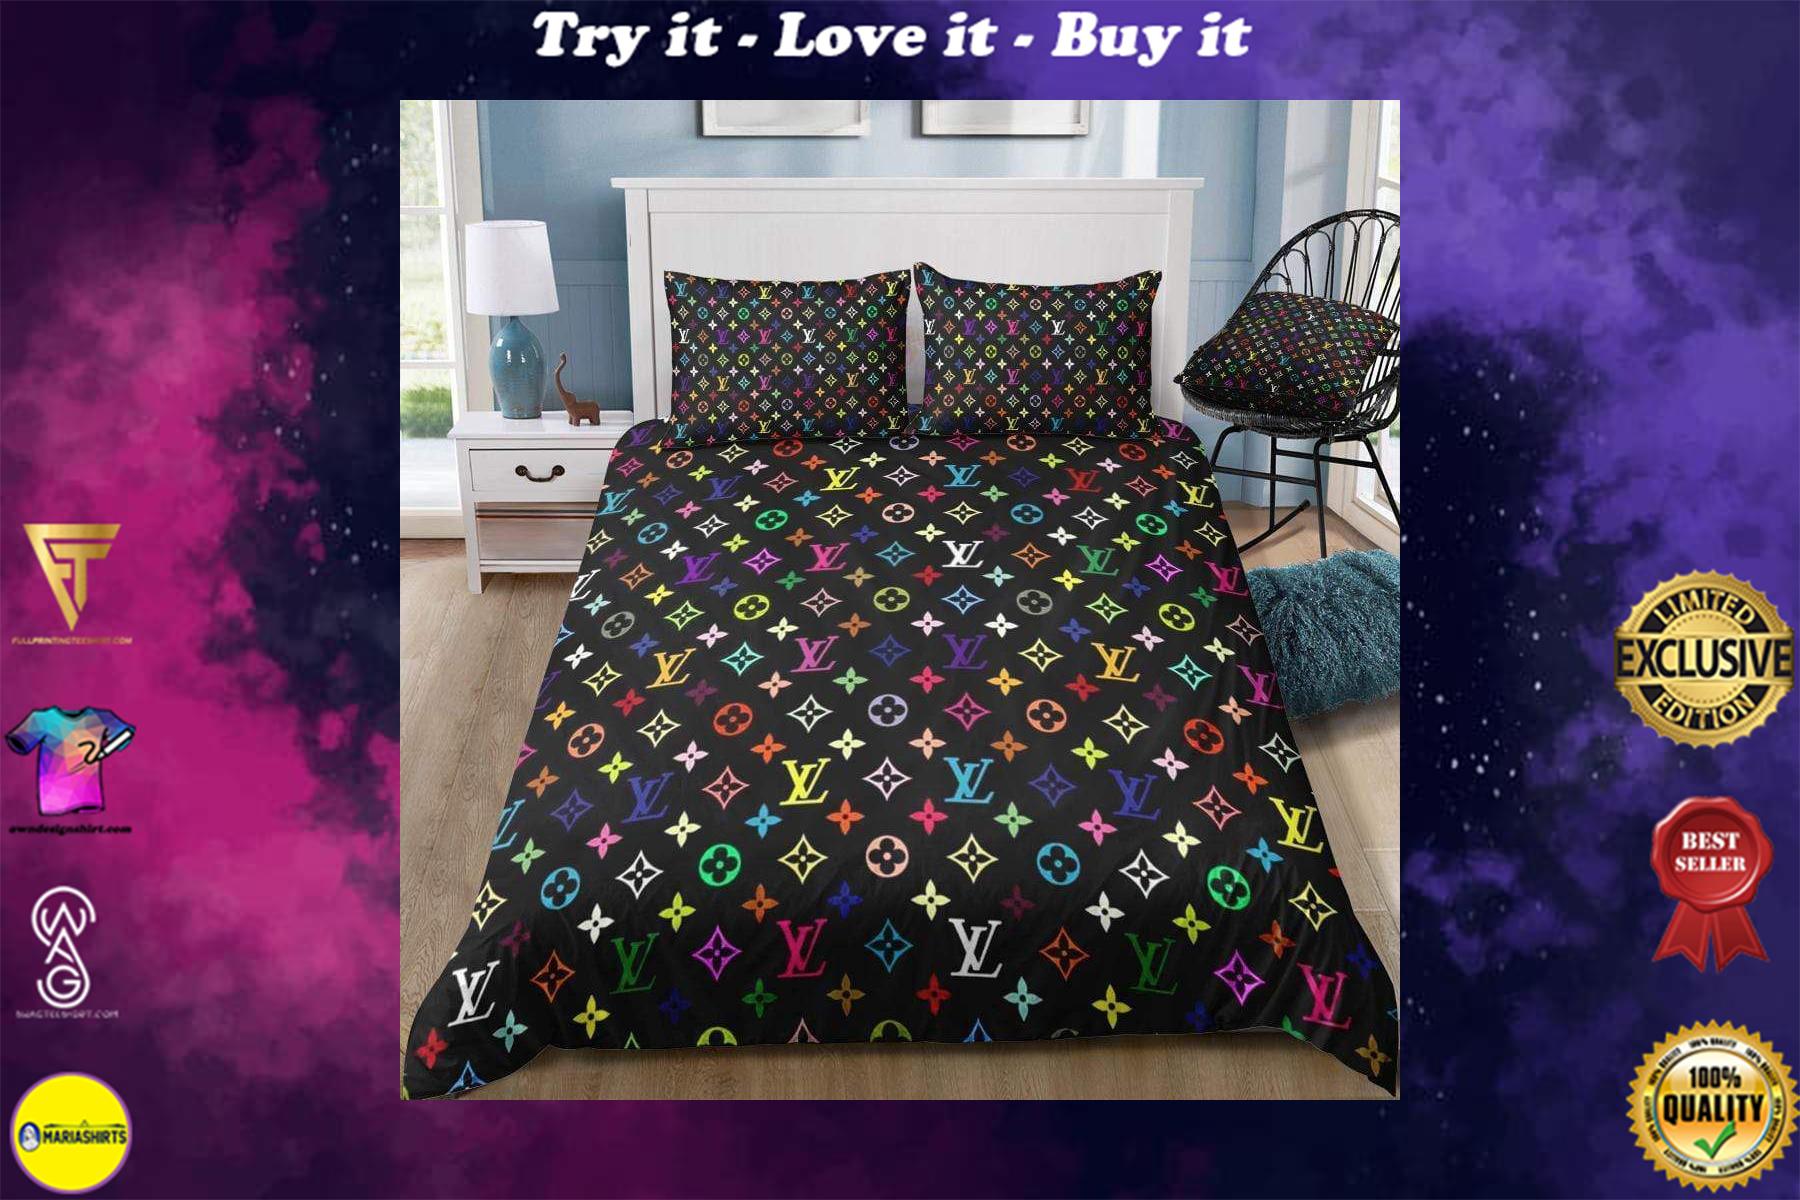 [special edition] louis vuitton monogram multi-color bedding set - maria